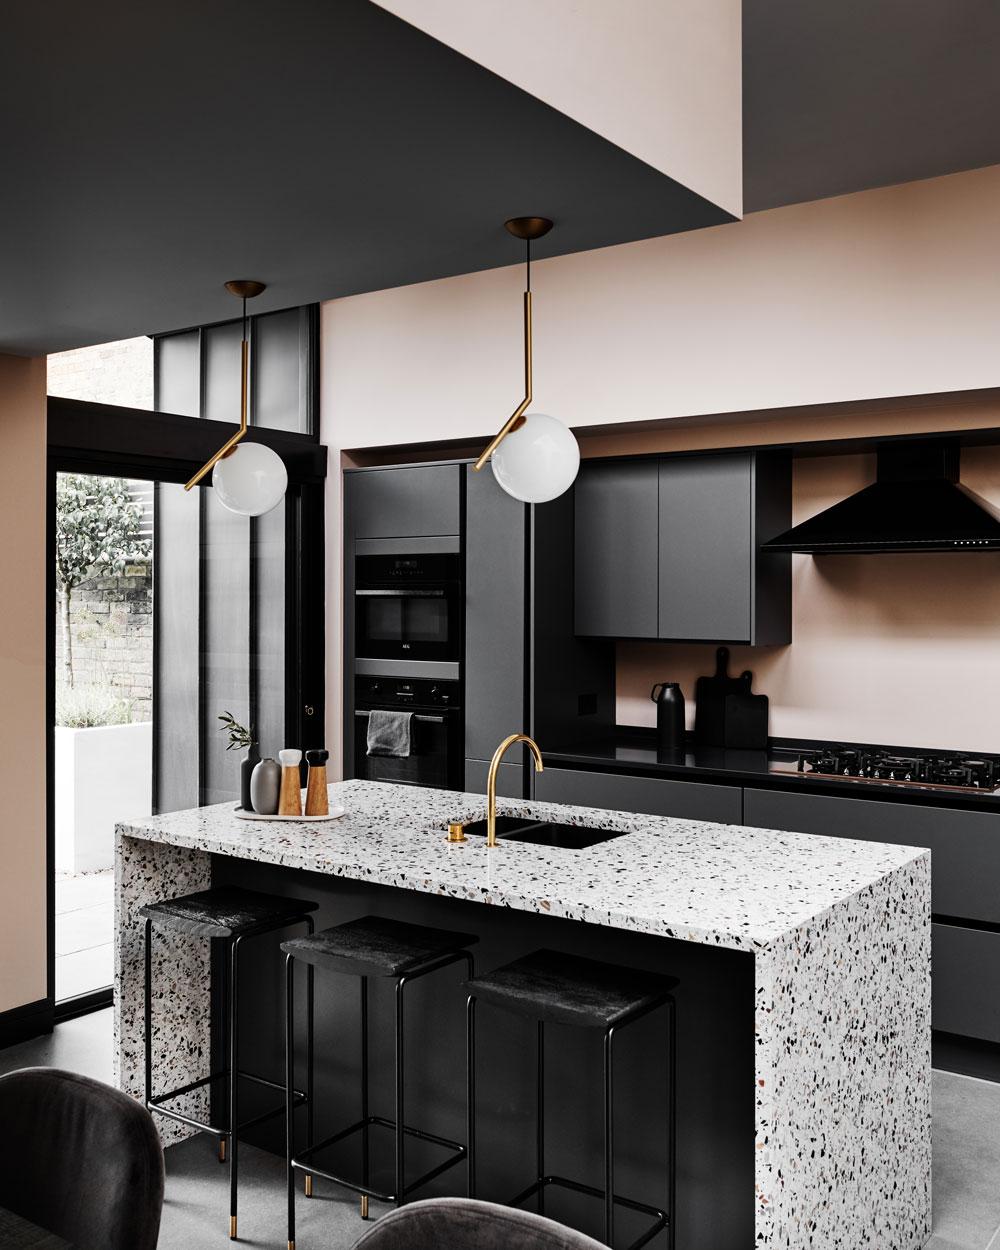 house_of_grey_black_kitchen.jpg